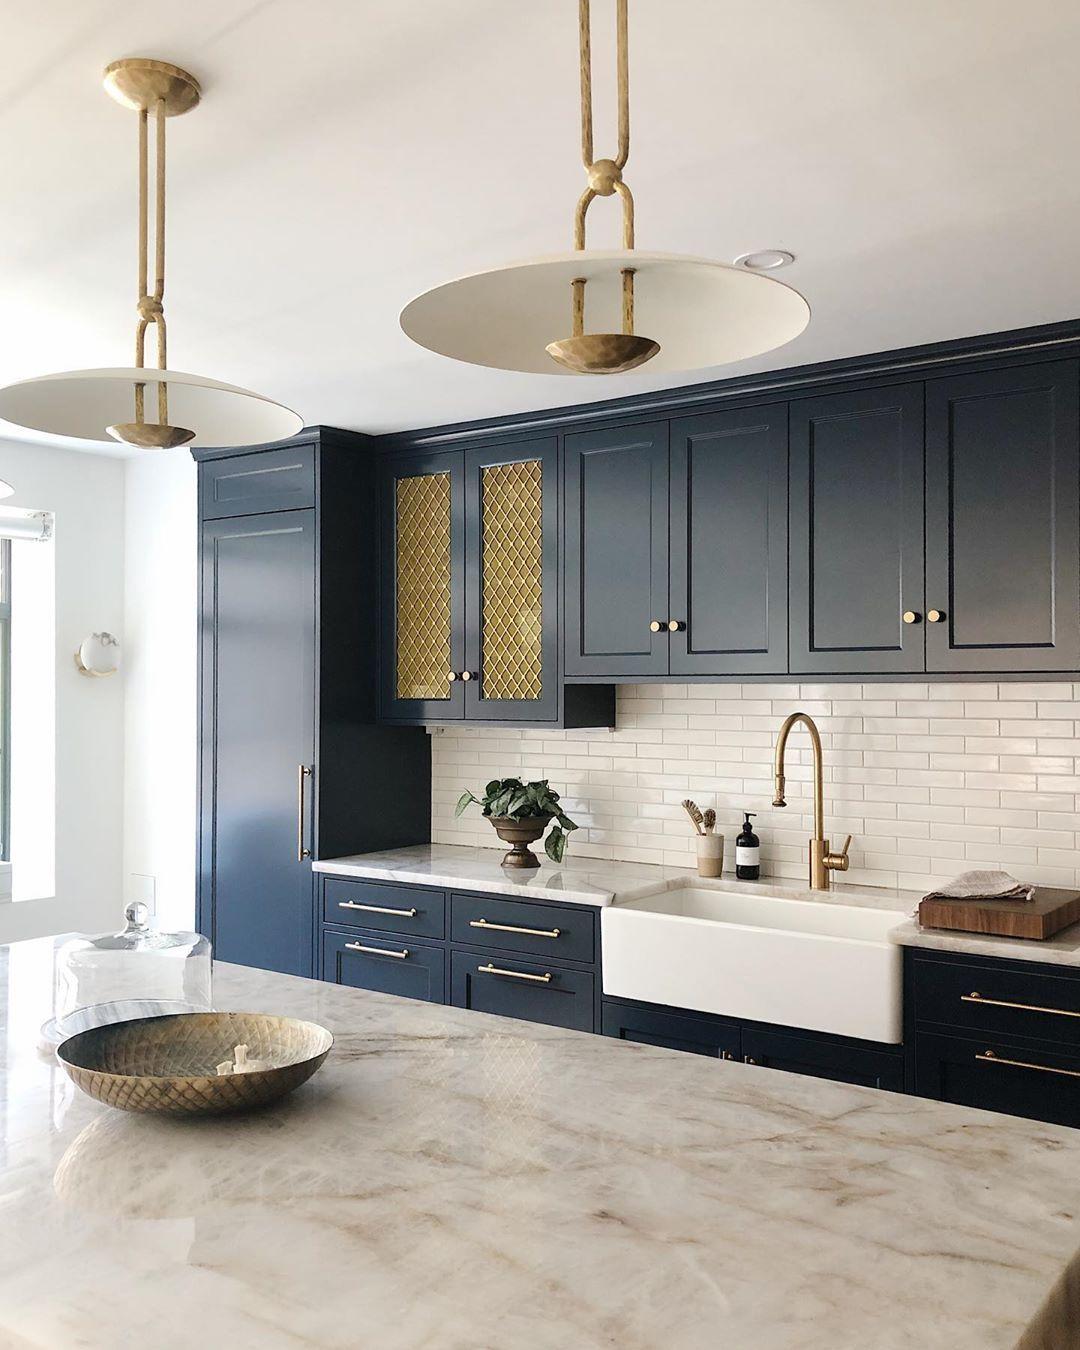 Kitchen Designer Jobs   Simple Home Design For Fun